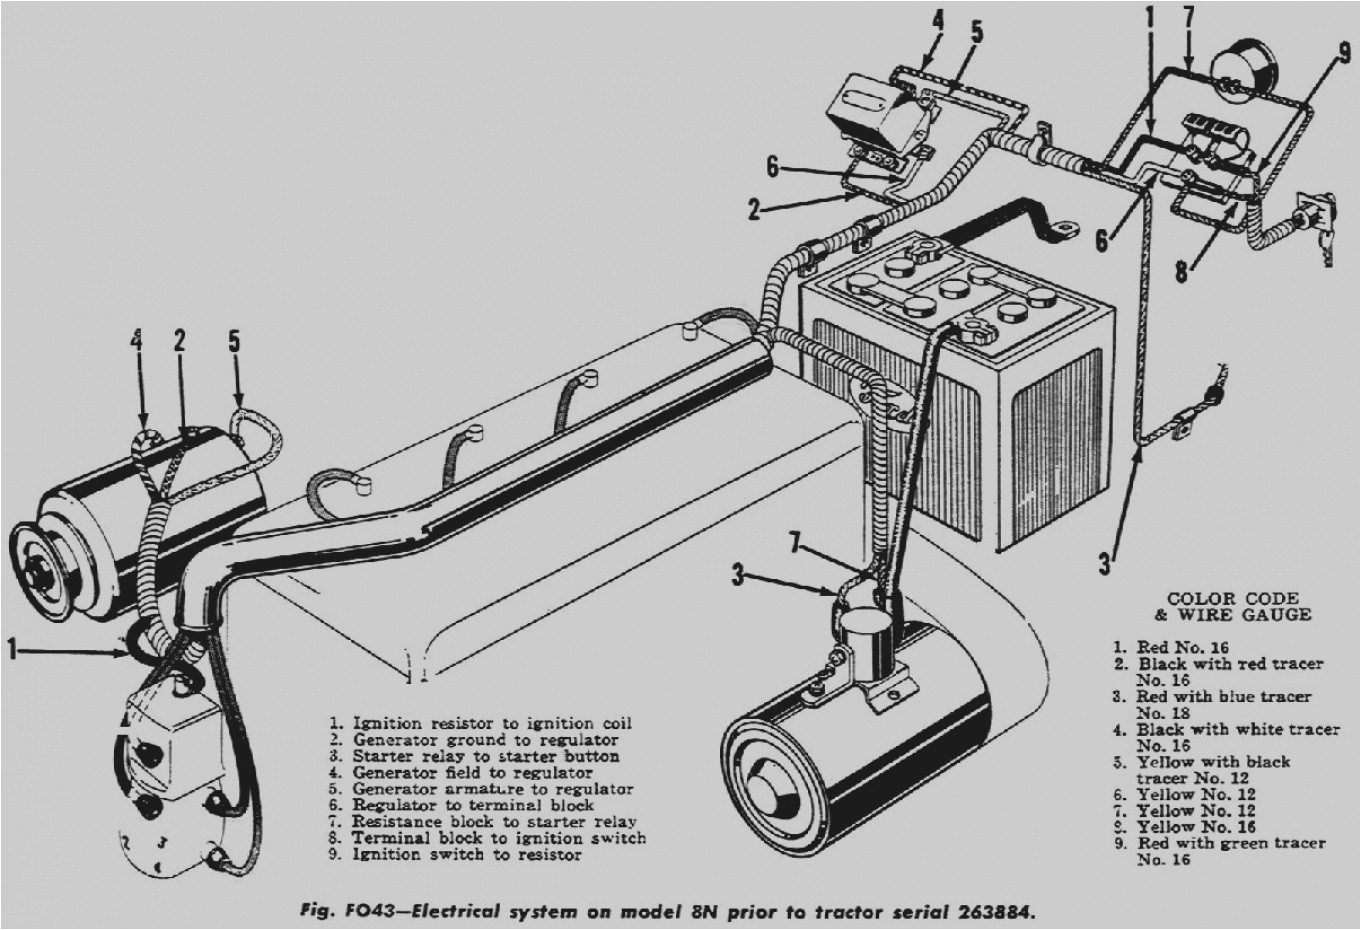 8n 12 volt wiring diagram wiring diagram database ford 8n 12 volt wiring harness